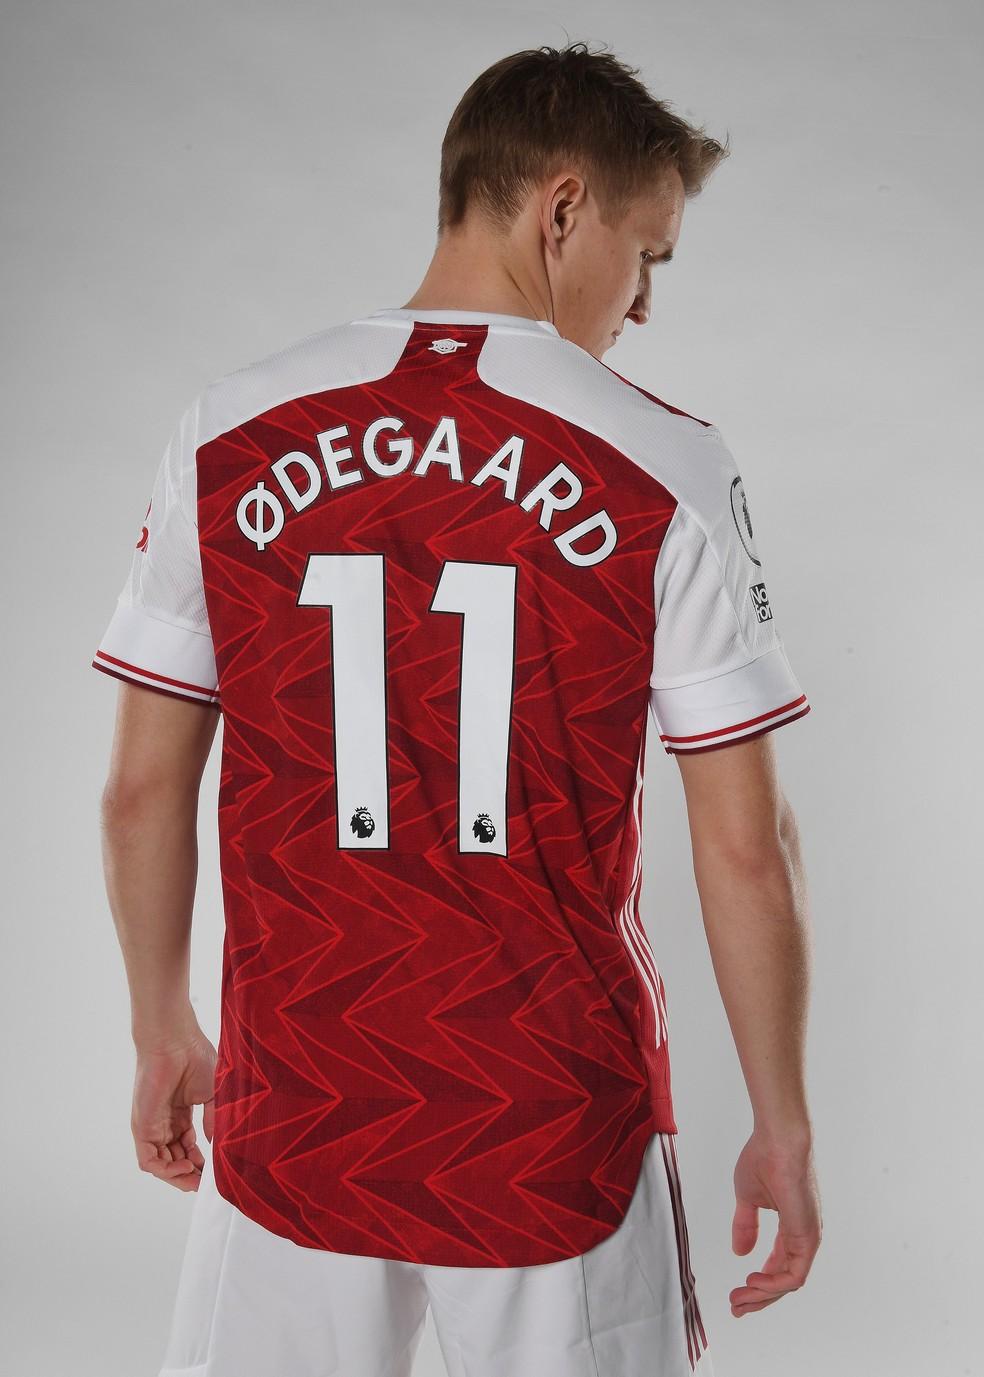 odegaard-arsenak-camisa-11.jpg